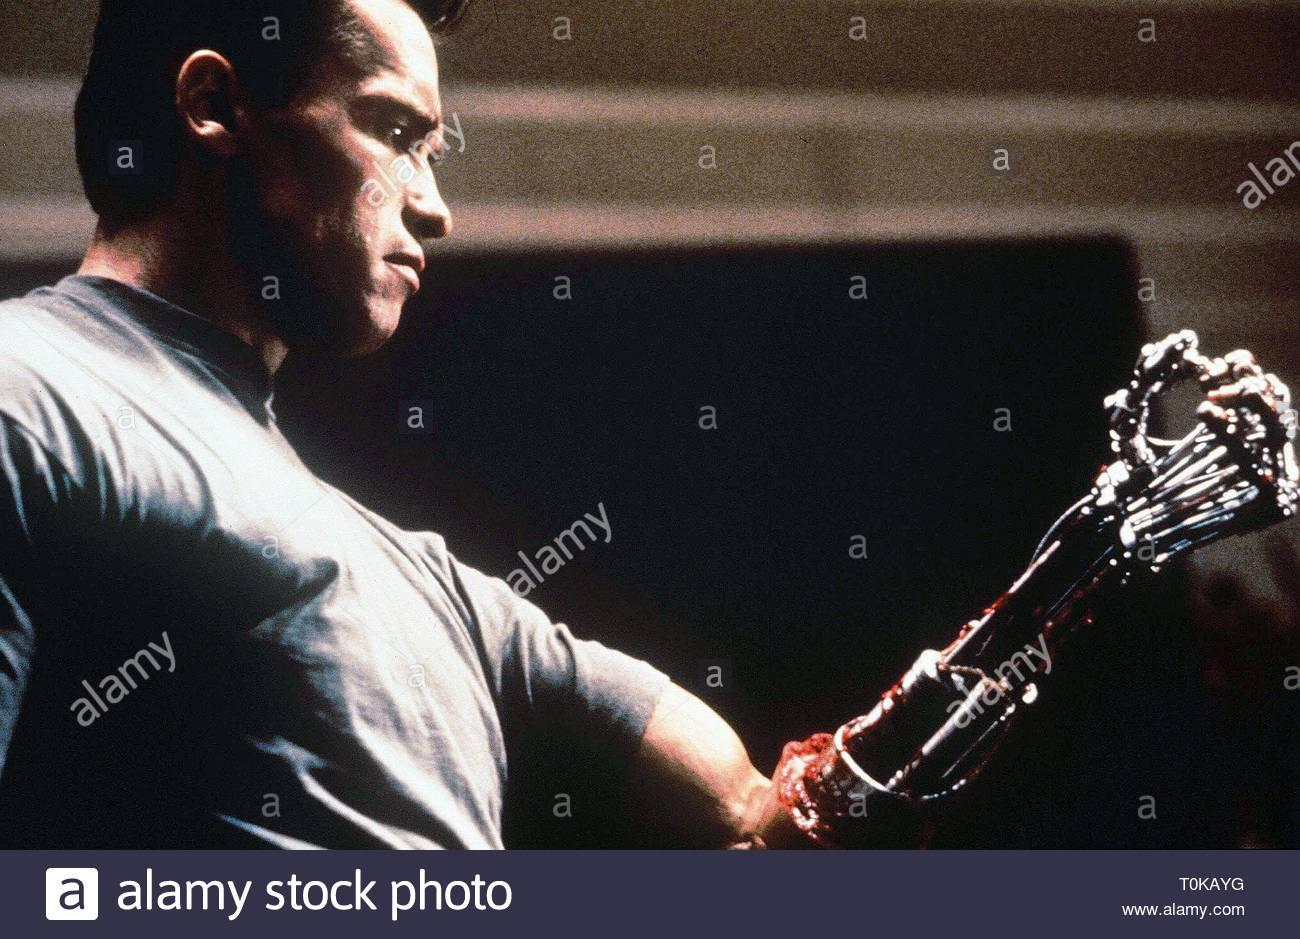 ARNOLD SCHWARZENEGGER, TERMINATOR 2: JUDGMENT DAY, 1991 - Stock Image